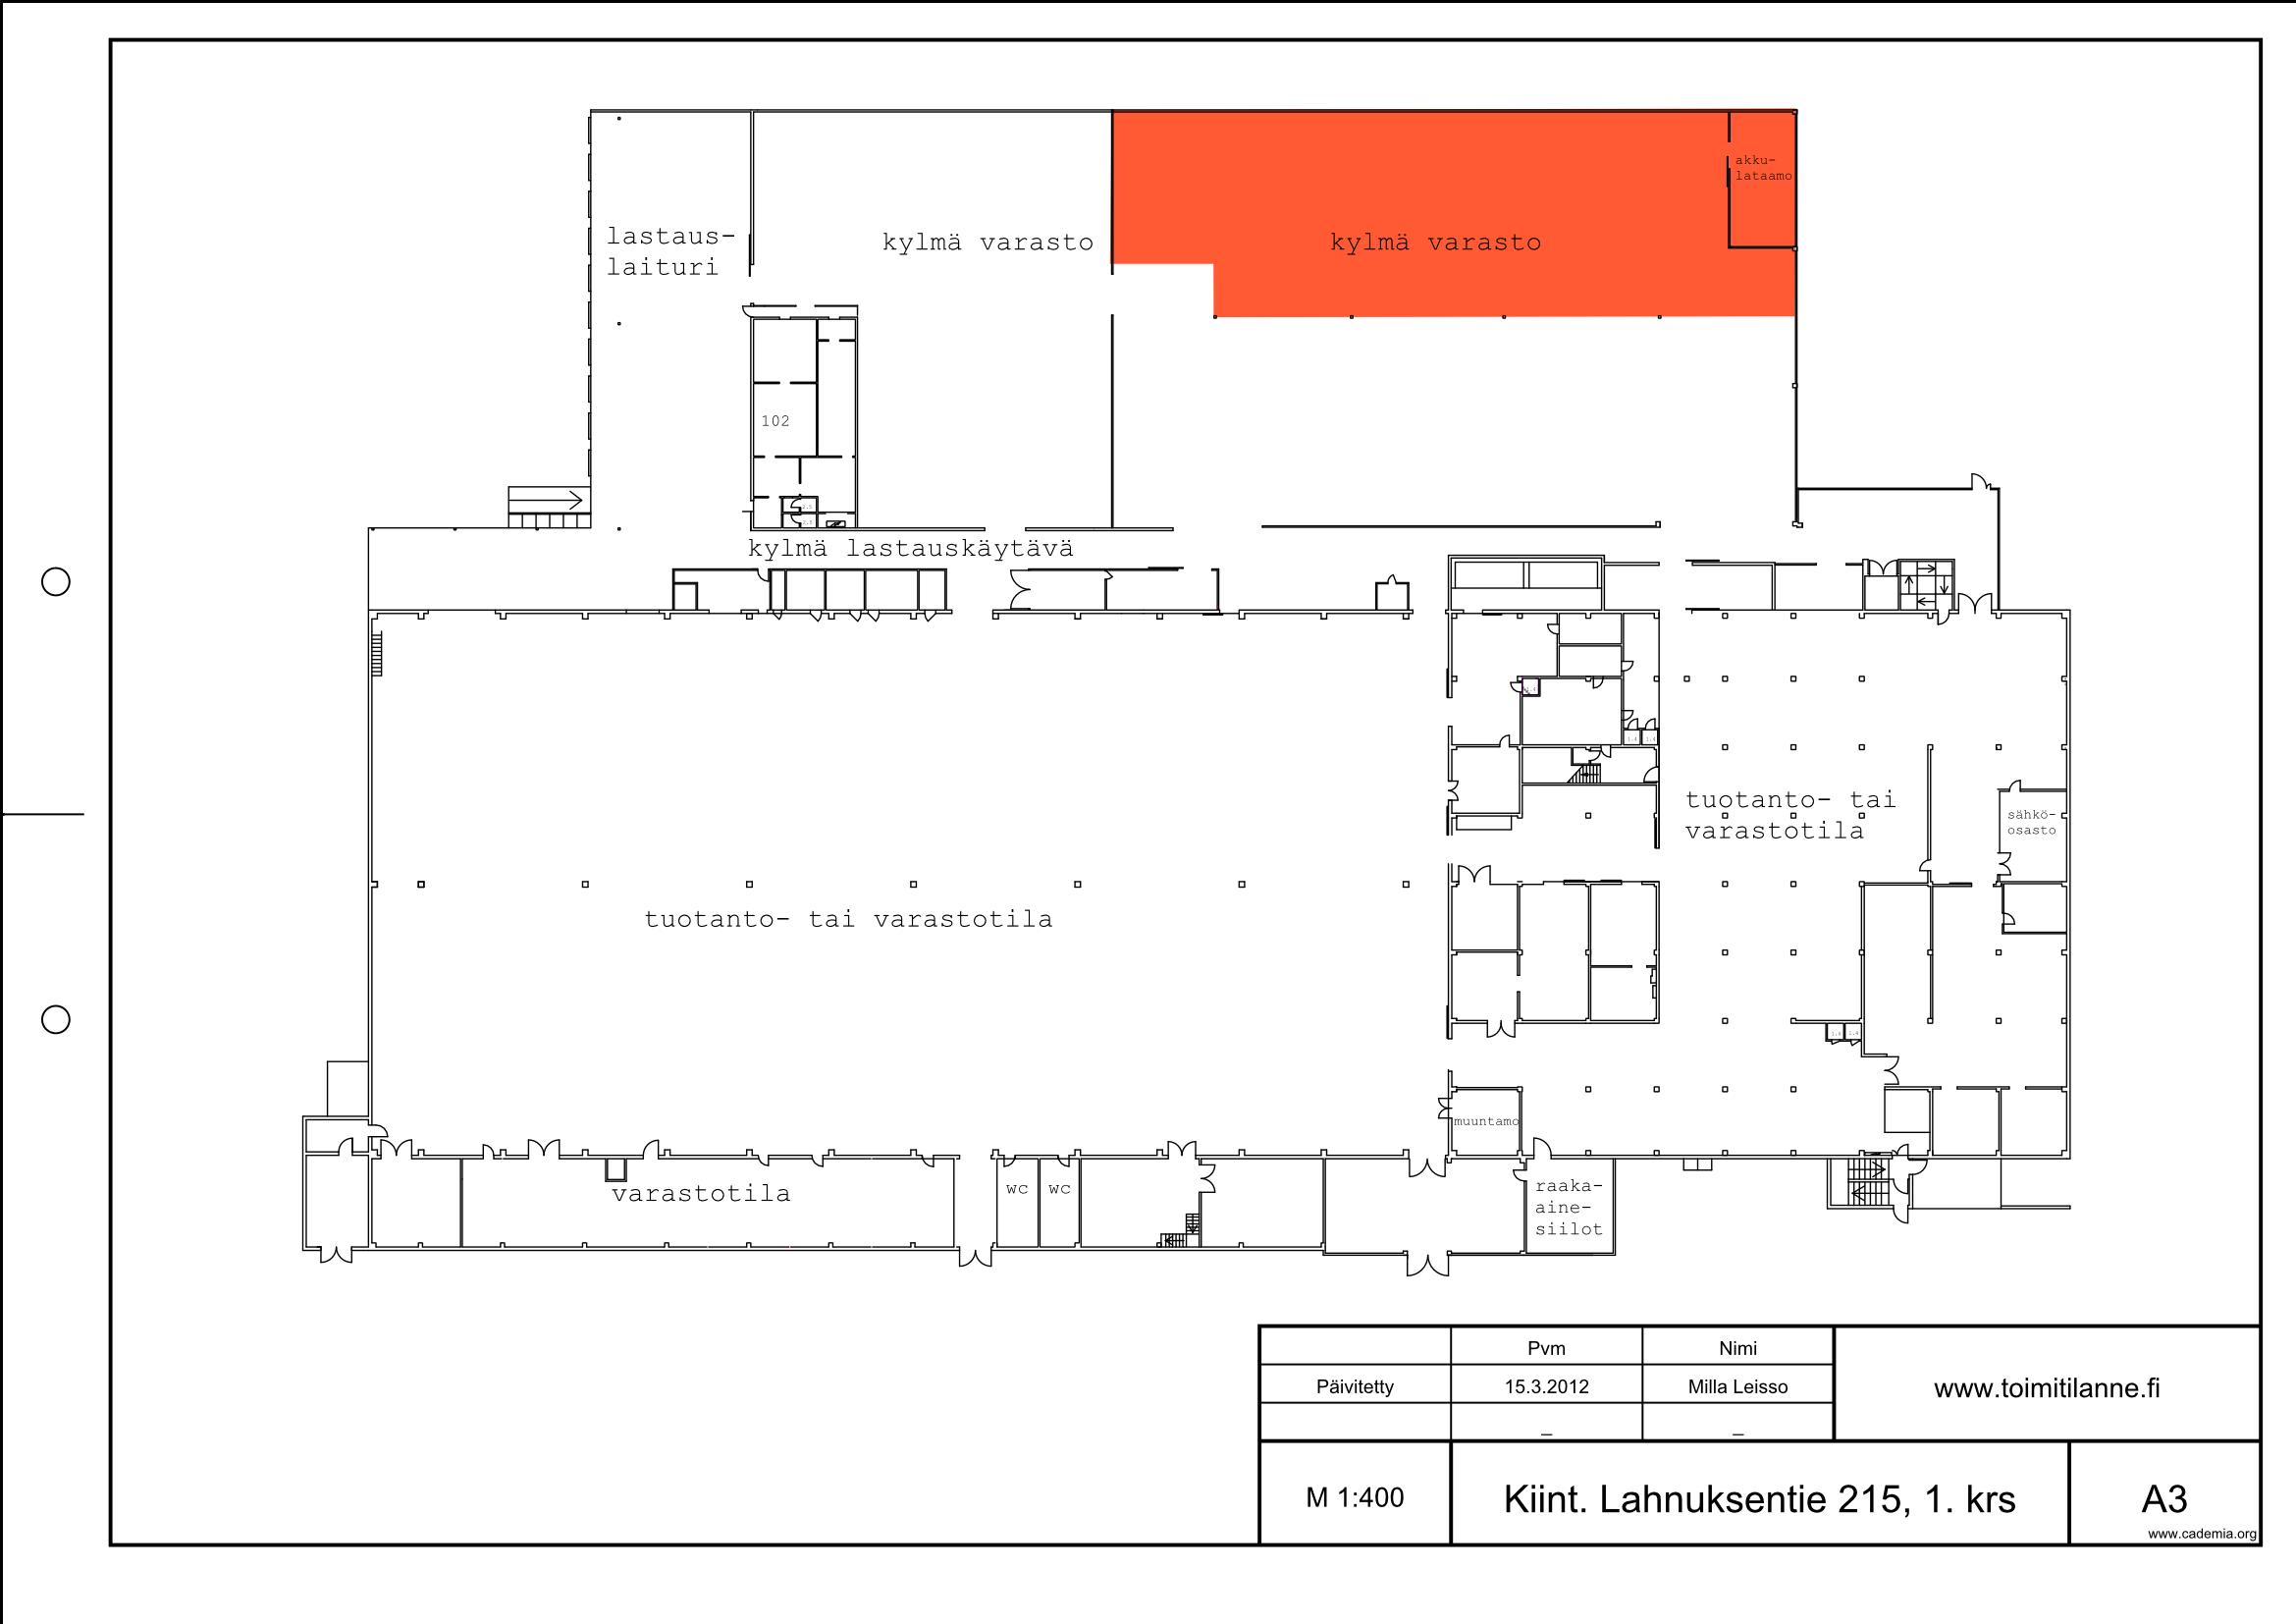 Toimitilanne Suomi, Nurmijärvi - Klaukkala, Lahnuksentie 215. Kylmä varastotila 750 m².